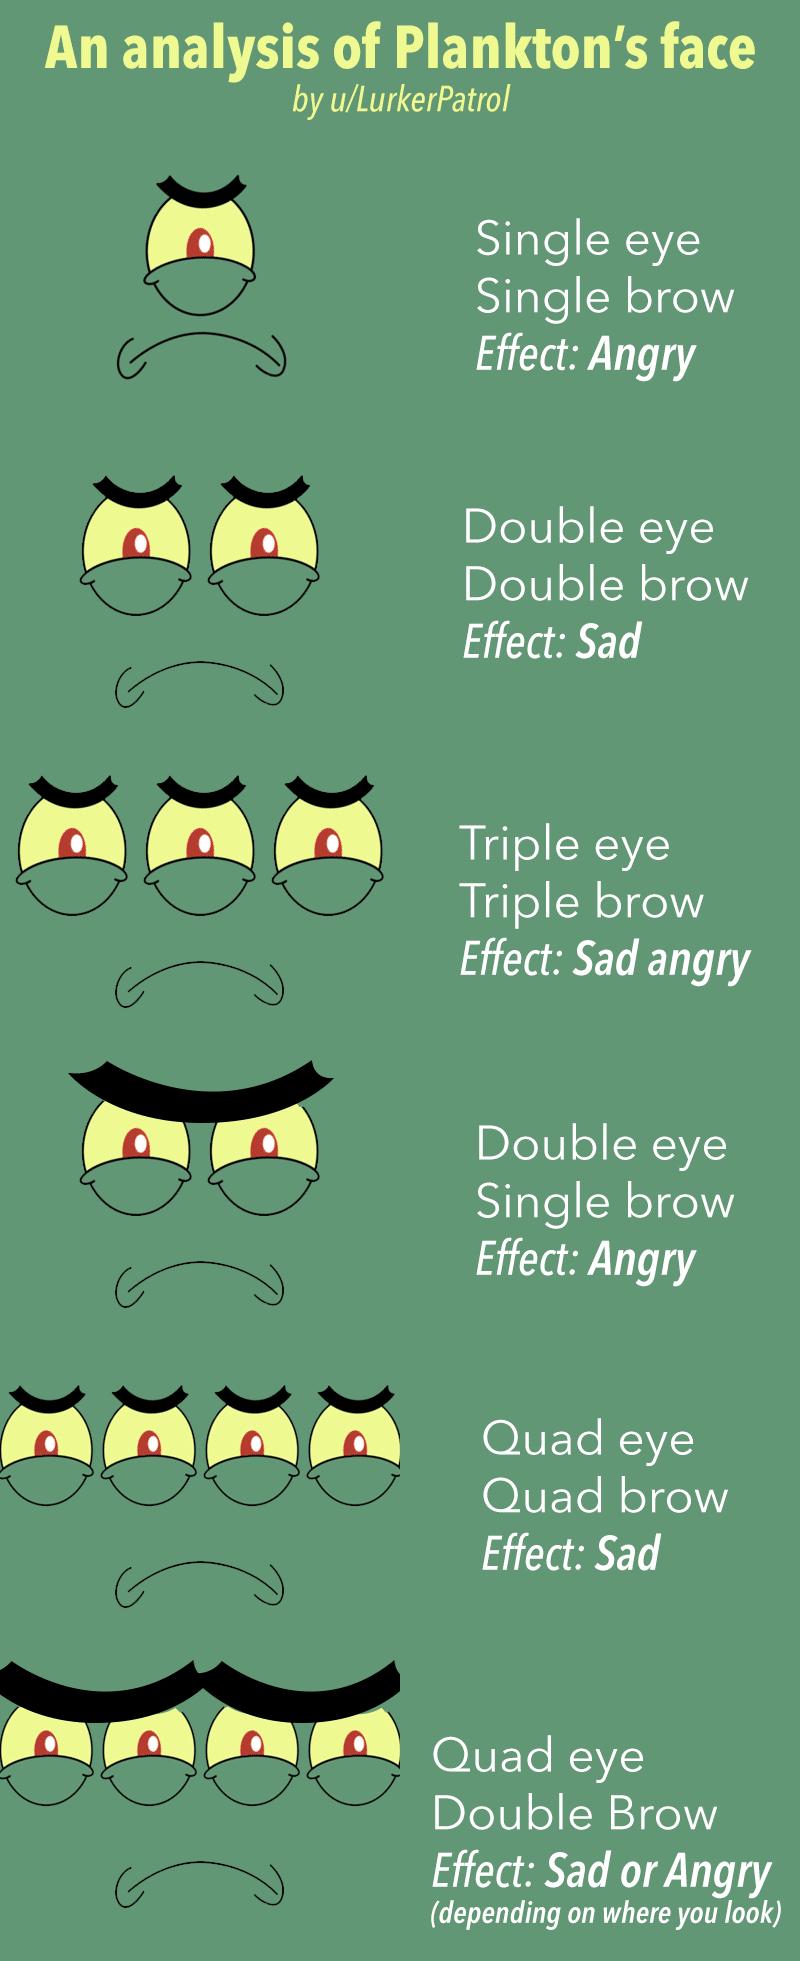 Spongebob, Sad, PhD Spongebob Memes Spongebob, Sad, PhD text: An analysis of Plankton's face by u/LurkerPatrol Single brow Effect: Angry Double brow Effect: Sad Triple brow Effect: Sad angry Double eye Single brow Effect: Angry Quad eye Quad brow Effect: Sad Quad eye Double Brow Effect: Sad or Angry (depending on where you look)